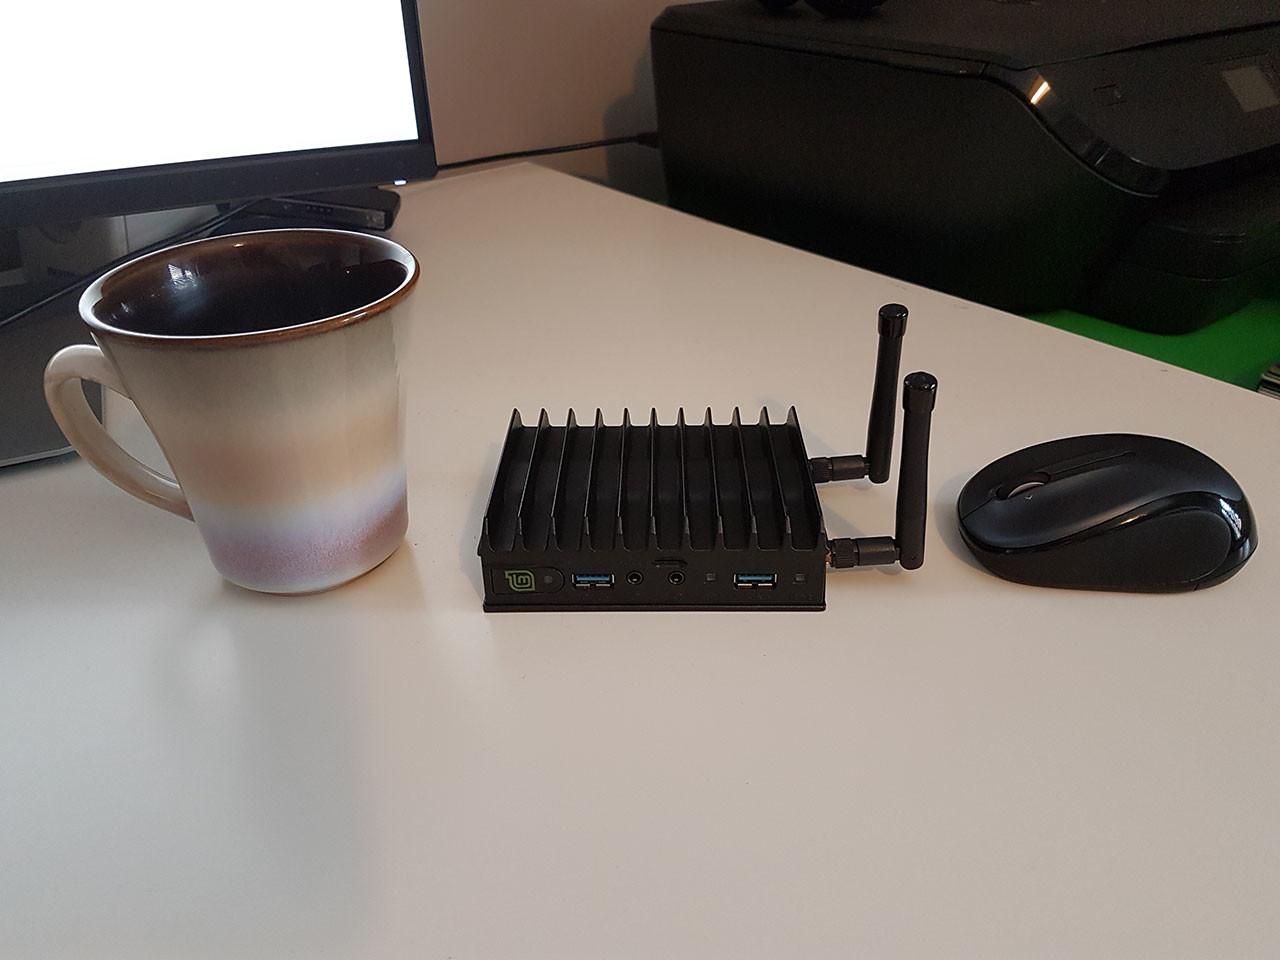 Compulab lanza el Mini PC Mintbox Mini 2